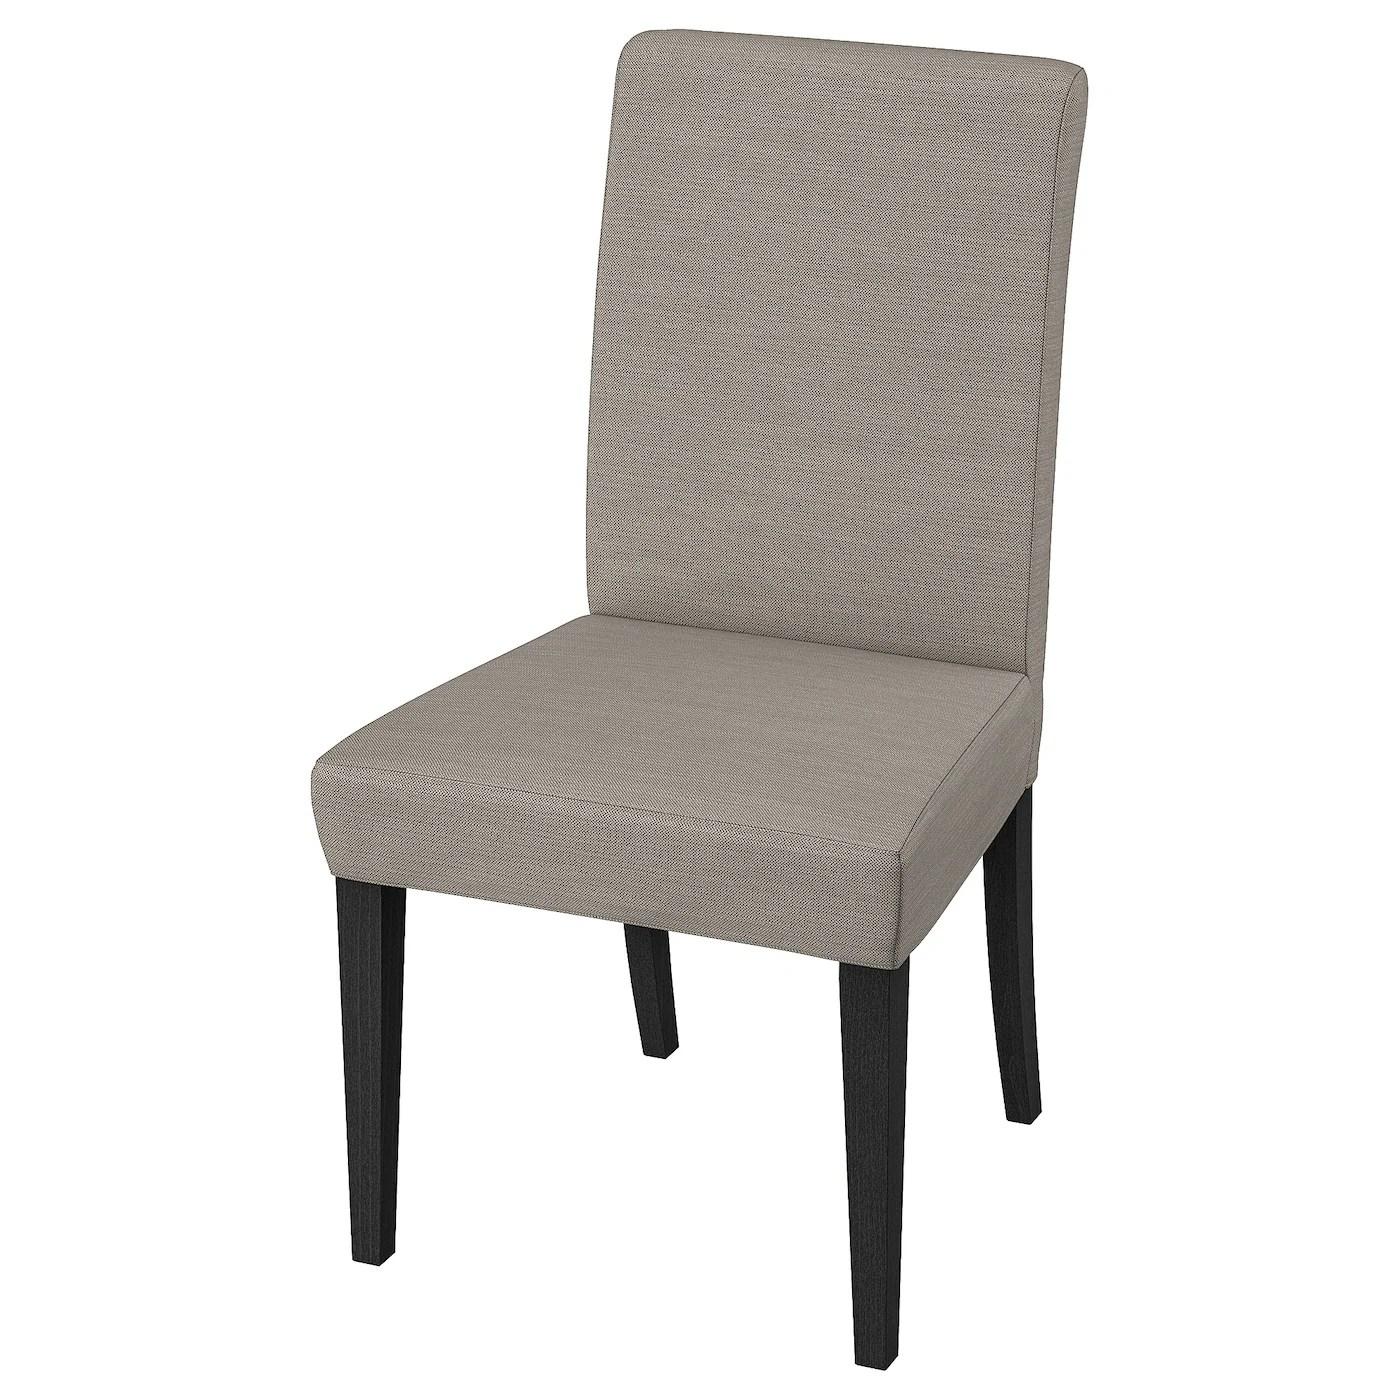 chaise design chaises salle a manger